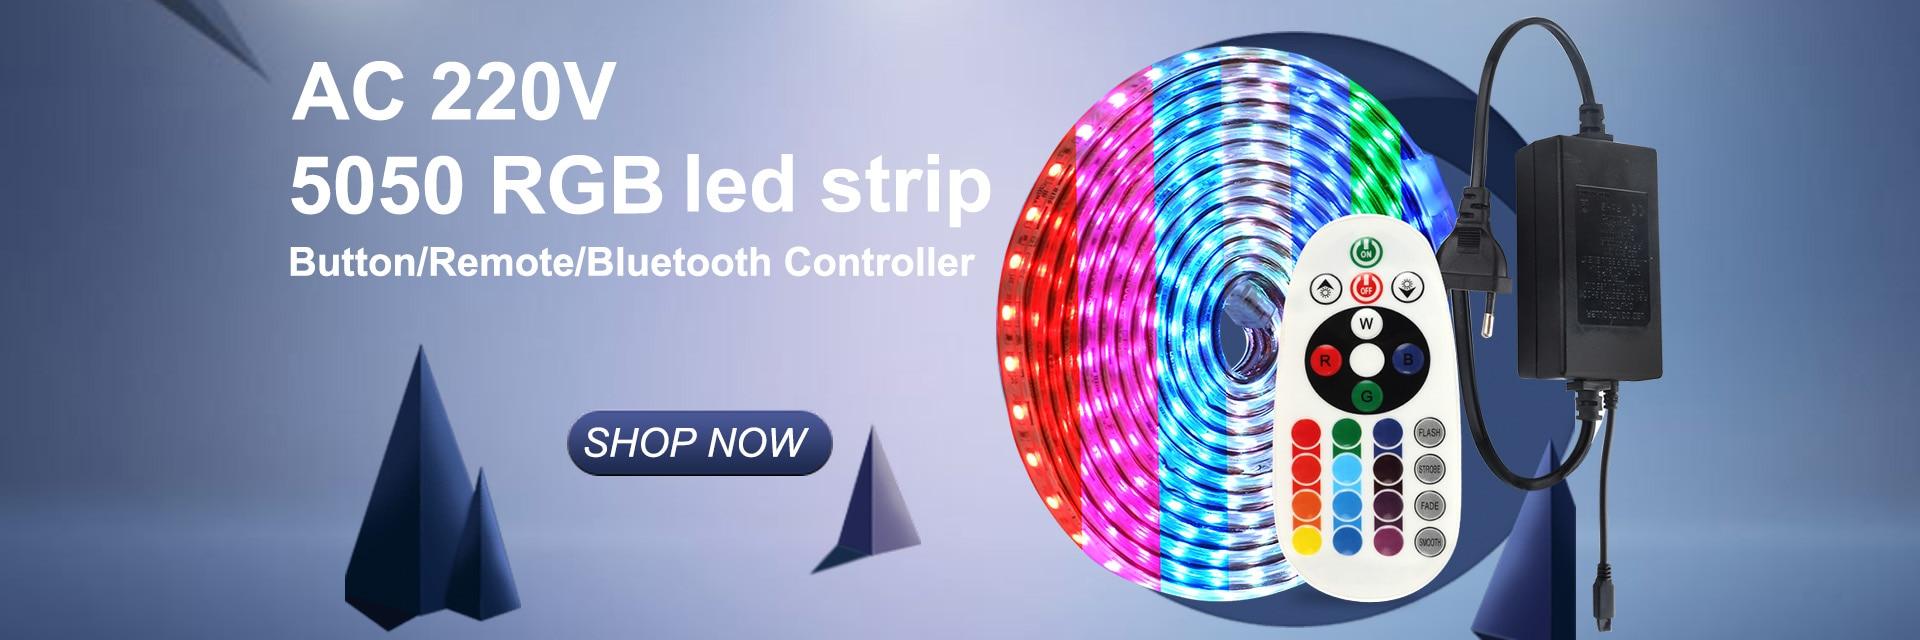 He29db02a719d4428ae2c8c4d766f8228n Waterproof SMD 5050 led tape AC220V flexible led strip 60 leds/Meter outdoor garden lighting with EU plug светодиодная лента